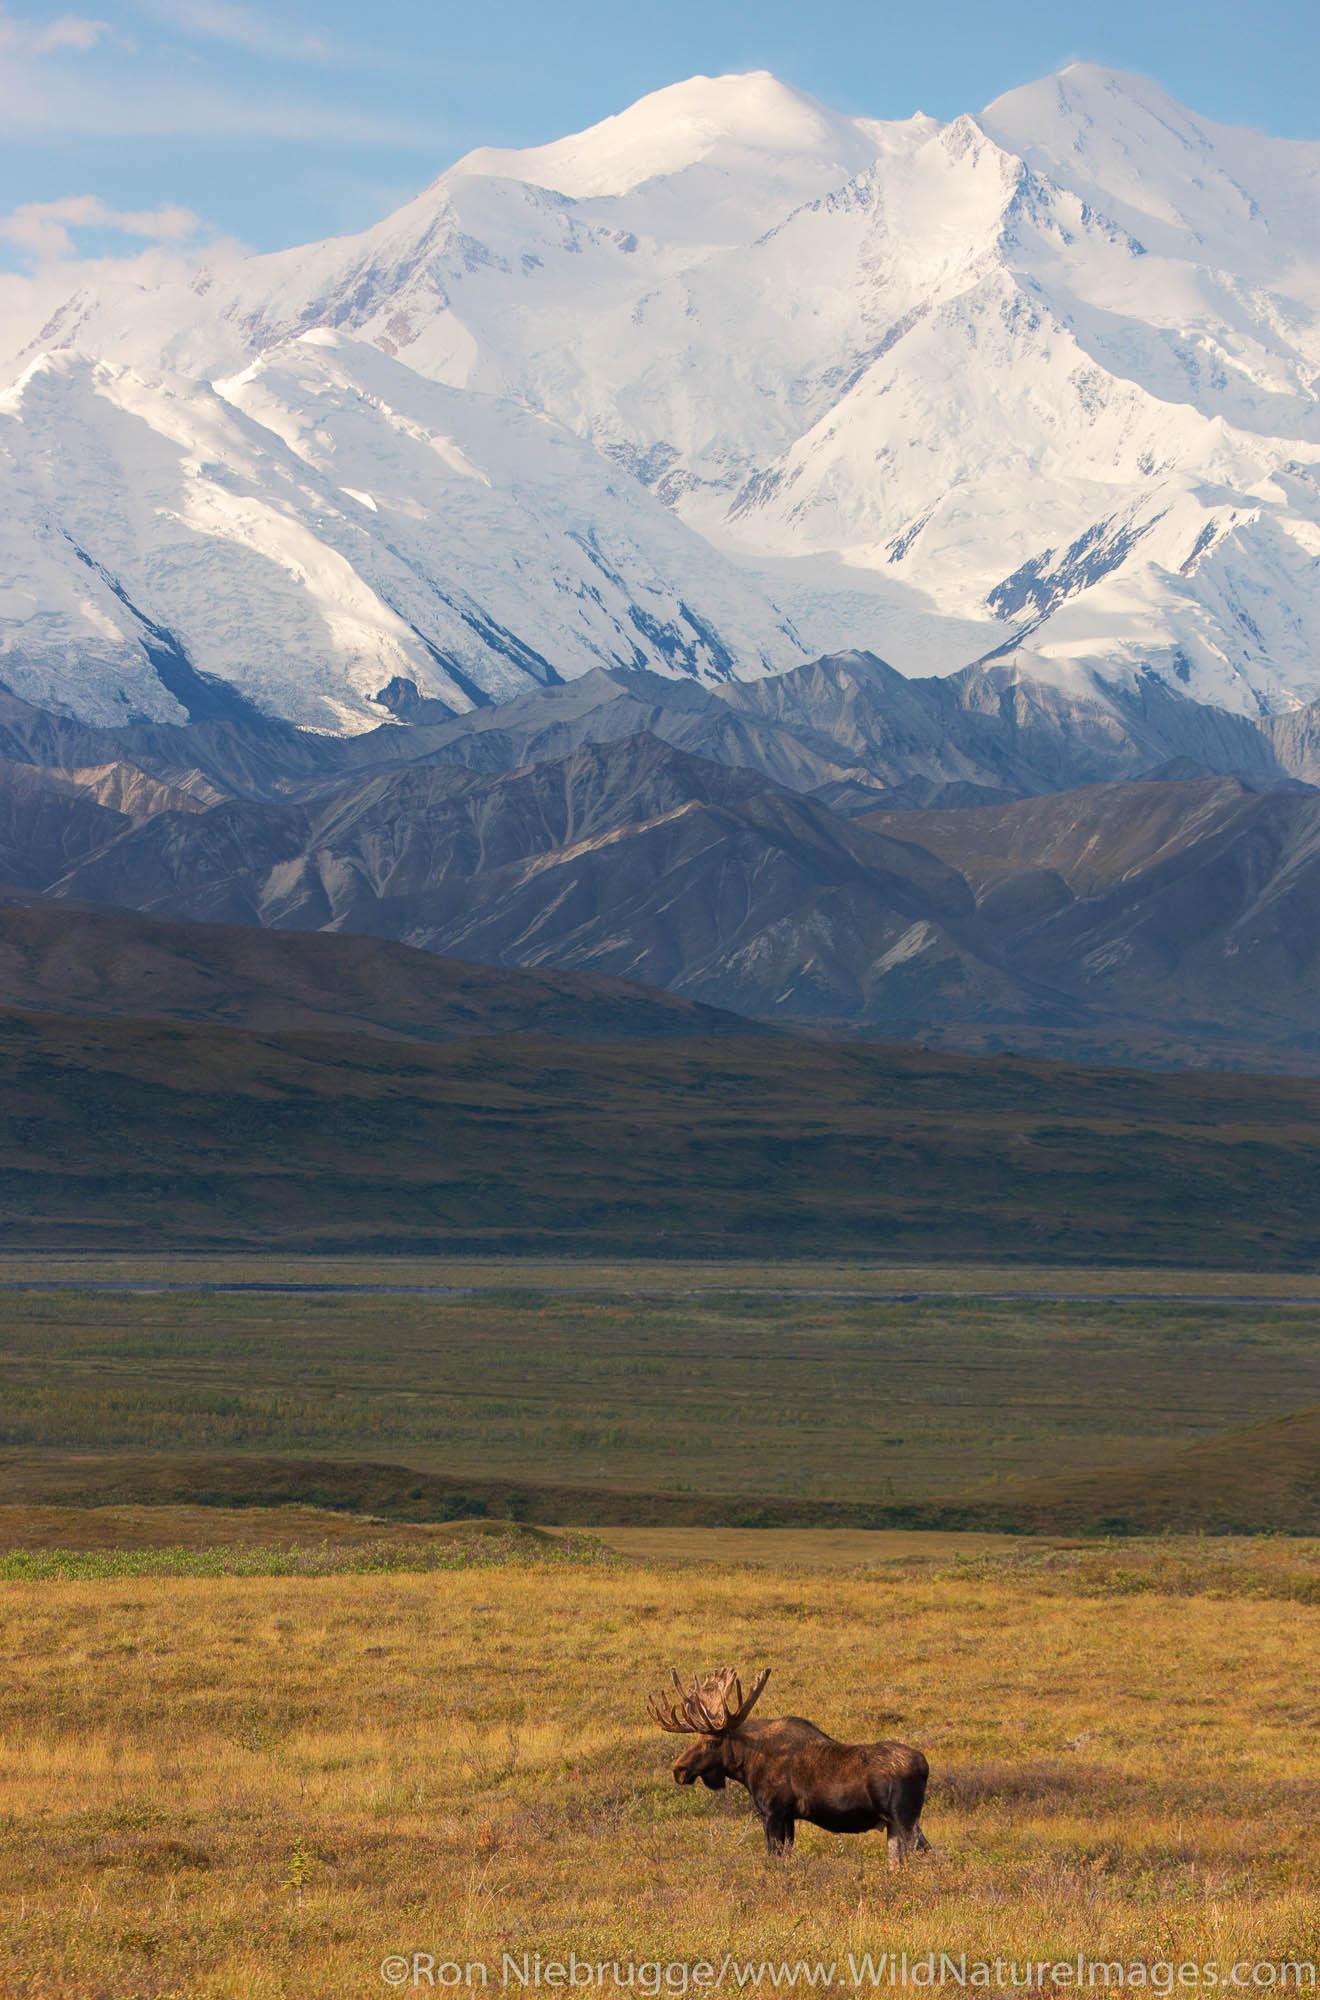 Bull moose in front of Mt. McKinley, Denali National Park, Alaska.